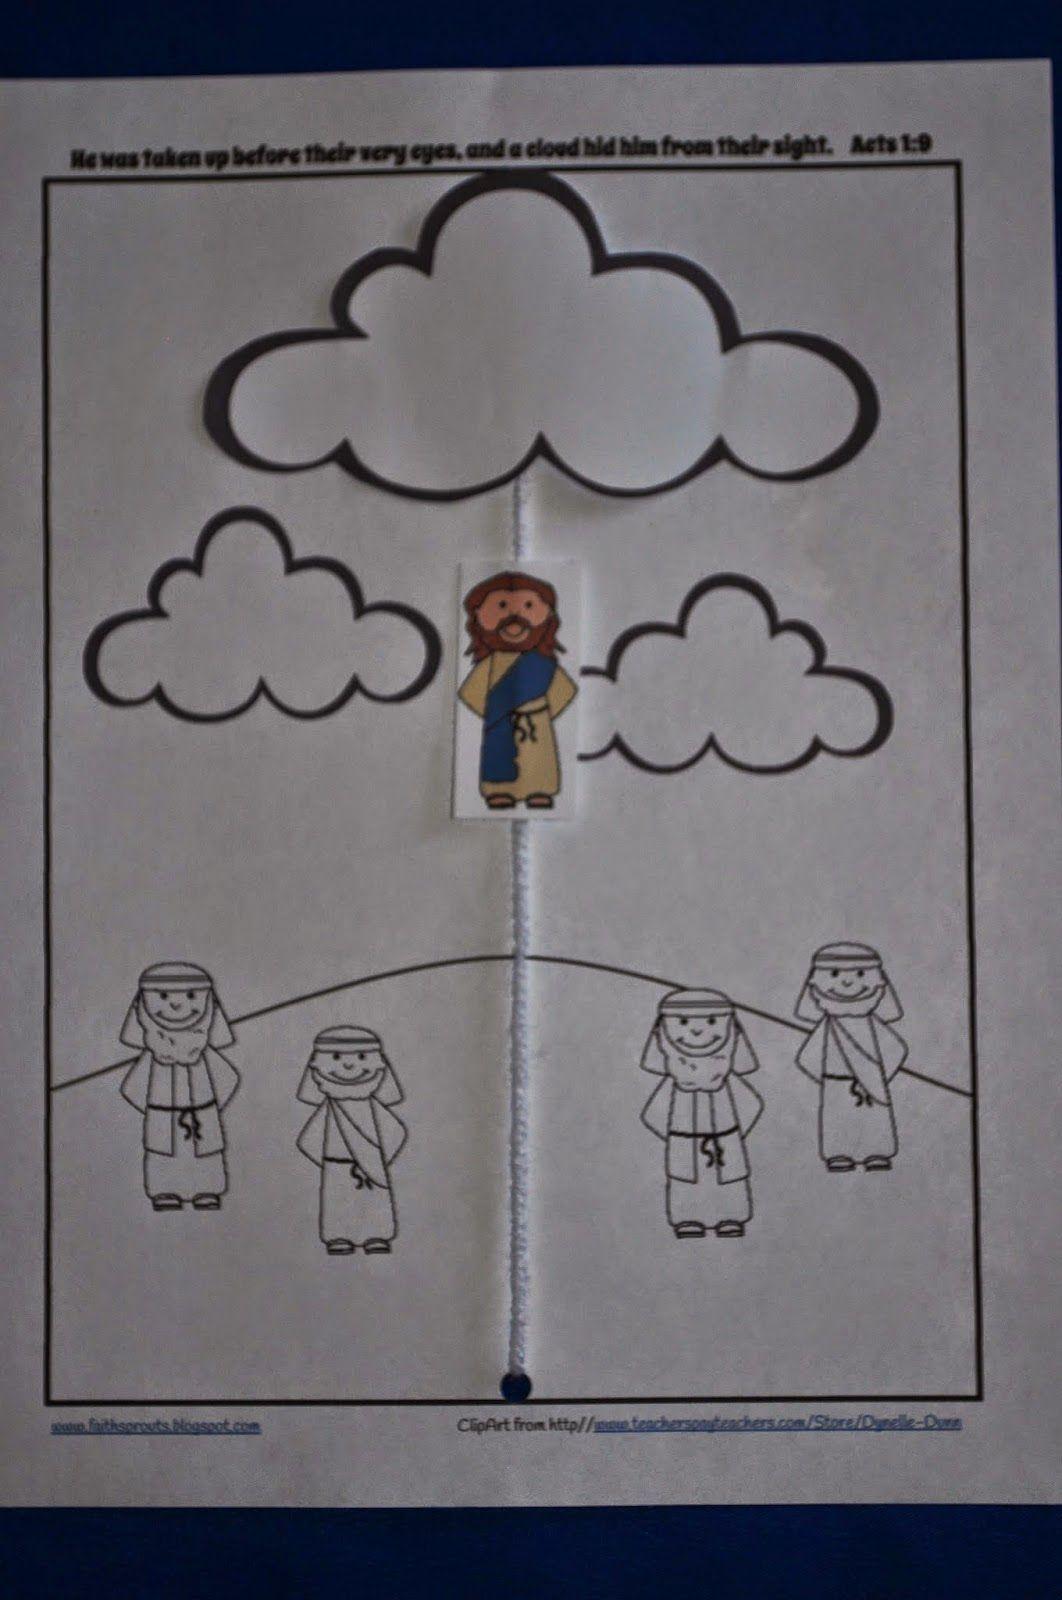 Jesus Ascends Into Heaven In A Cloud